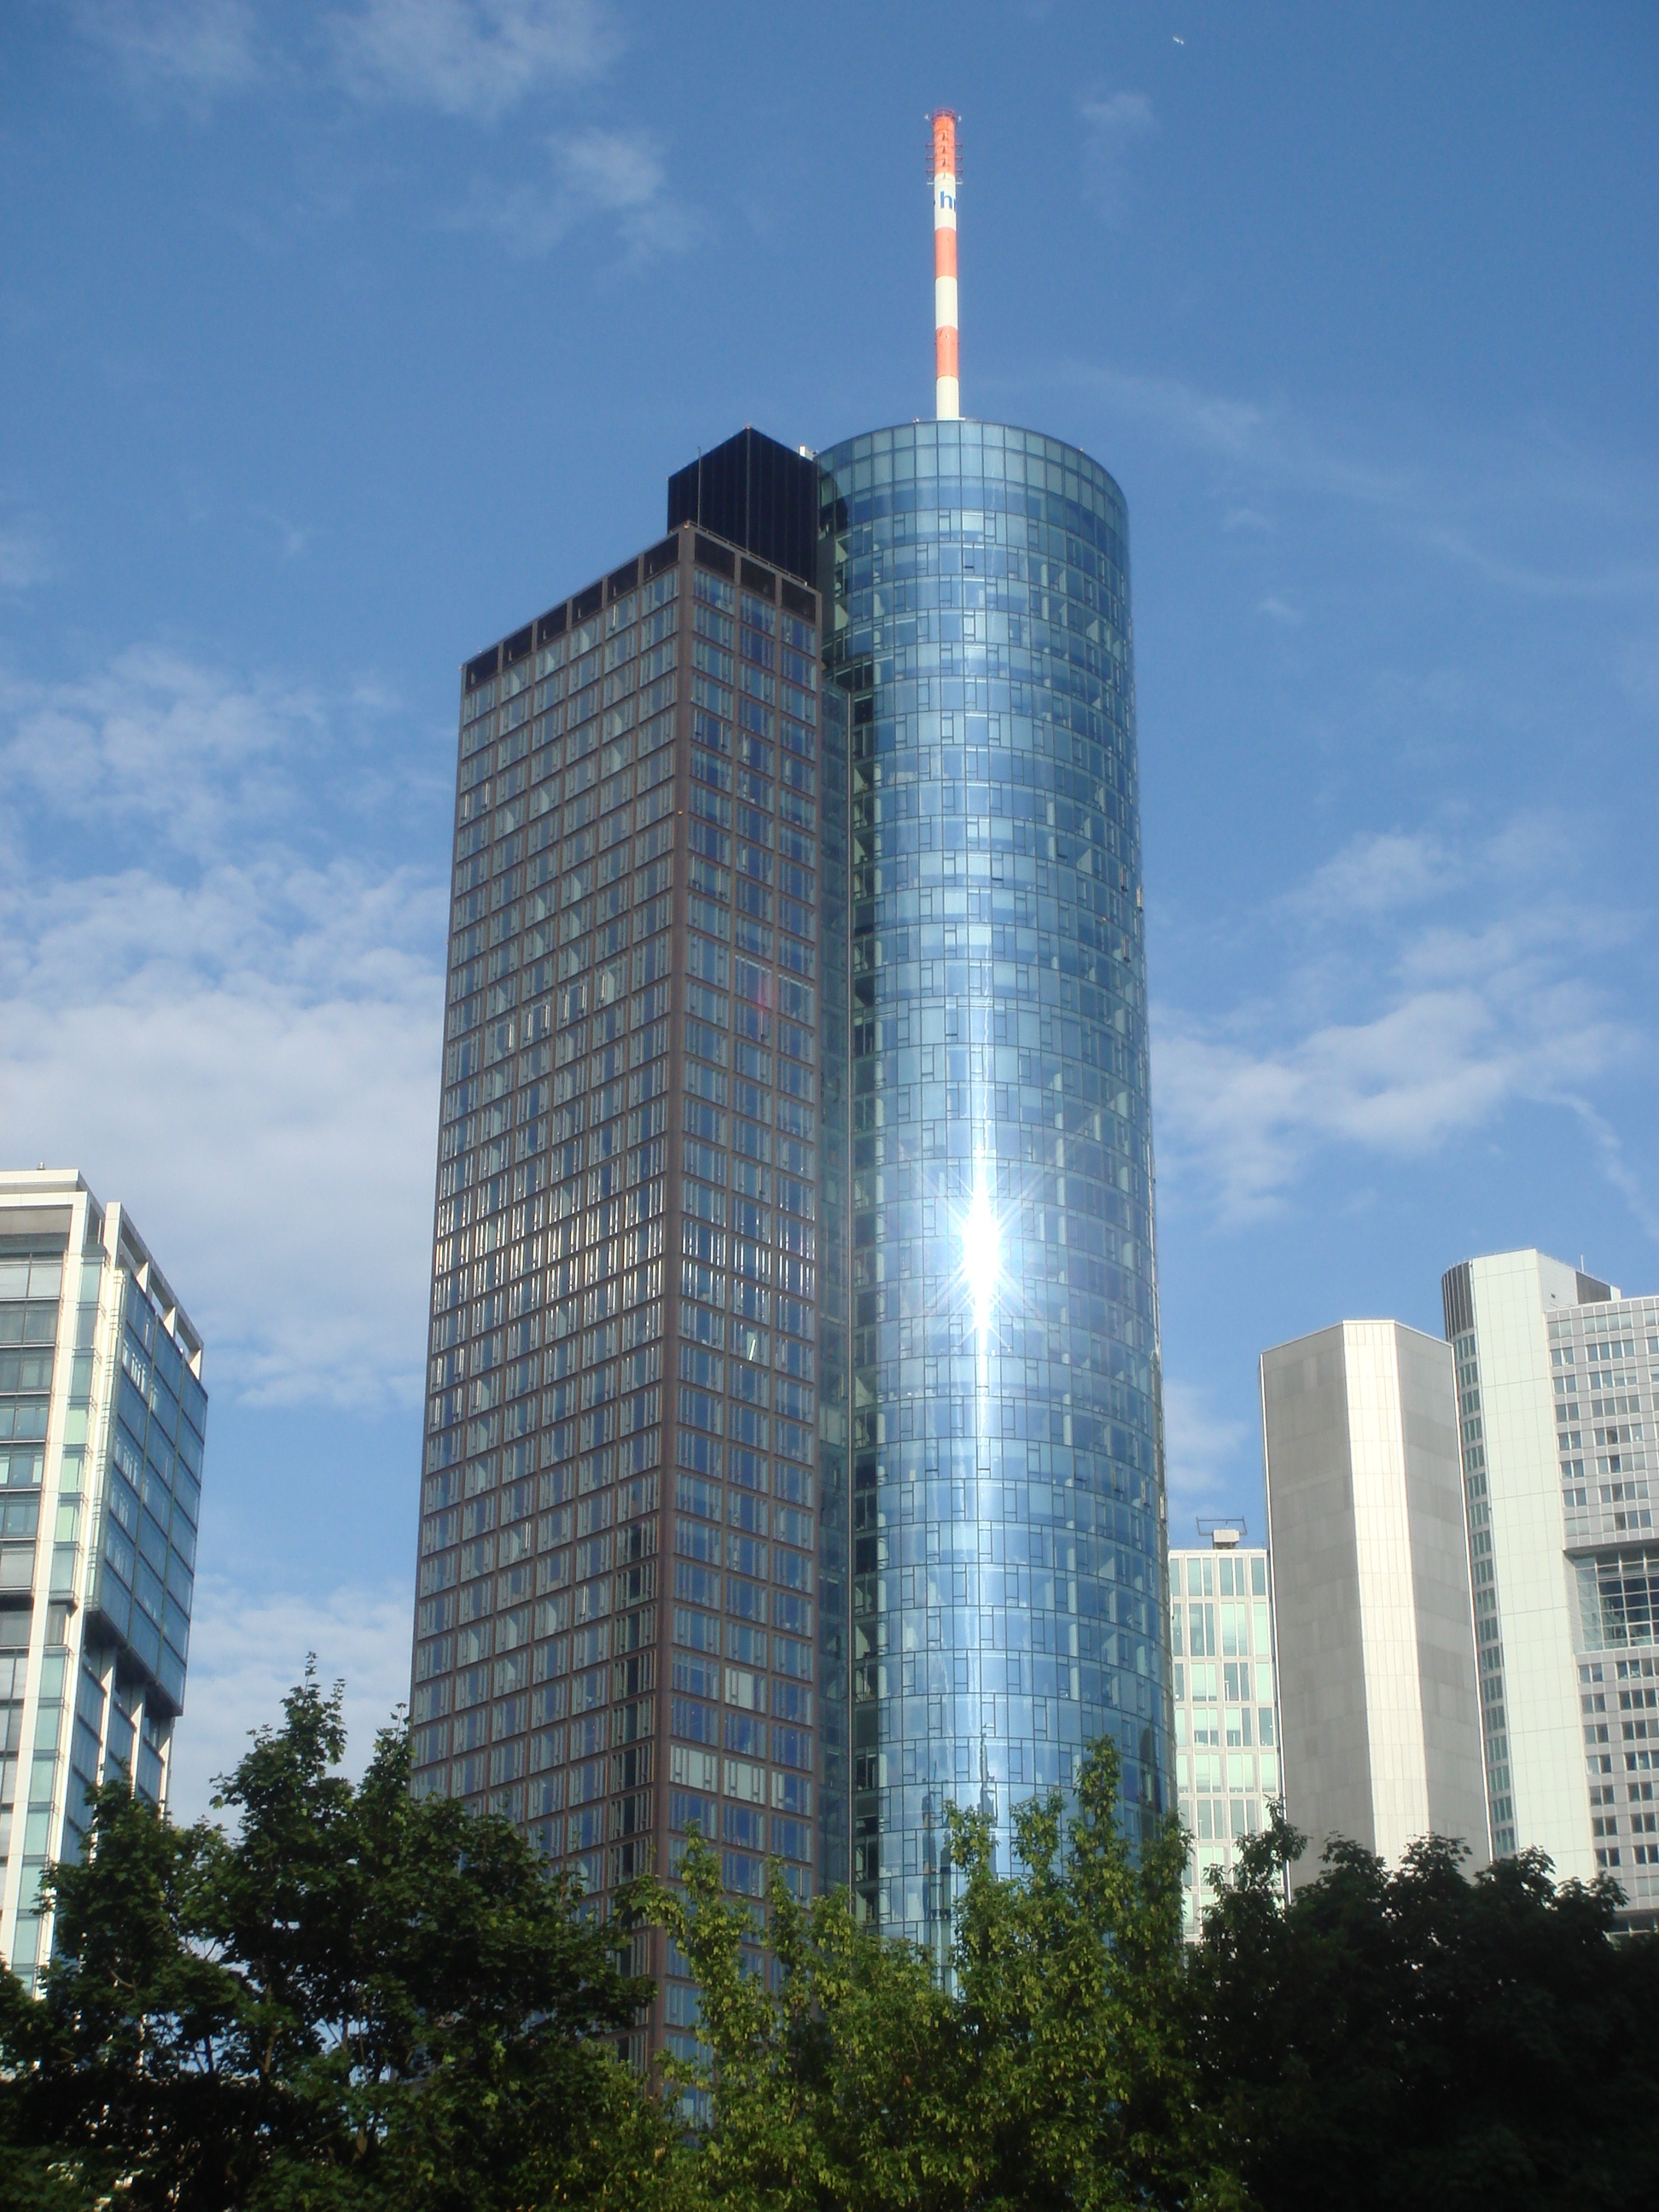 Maintower frankfurt sun.jpg